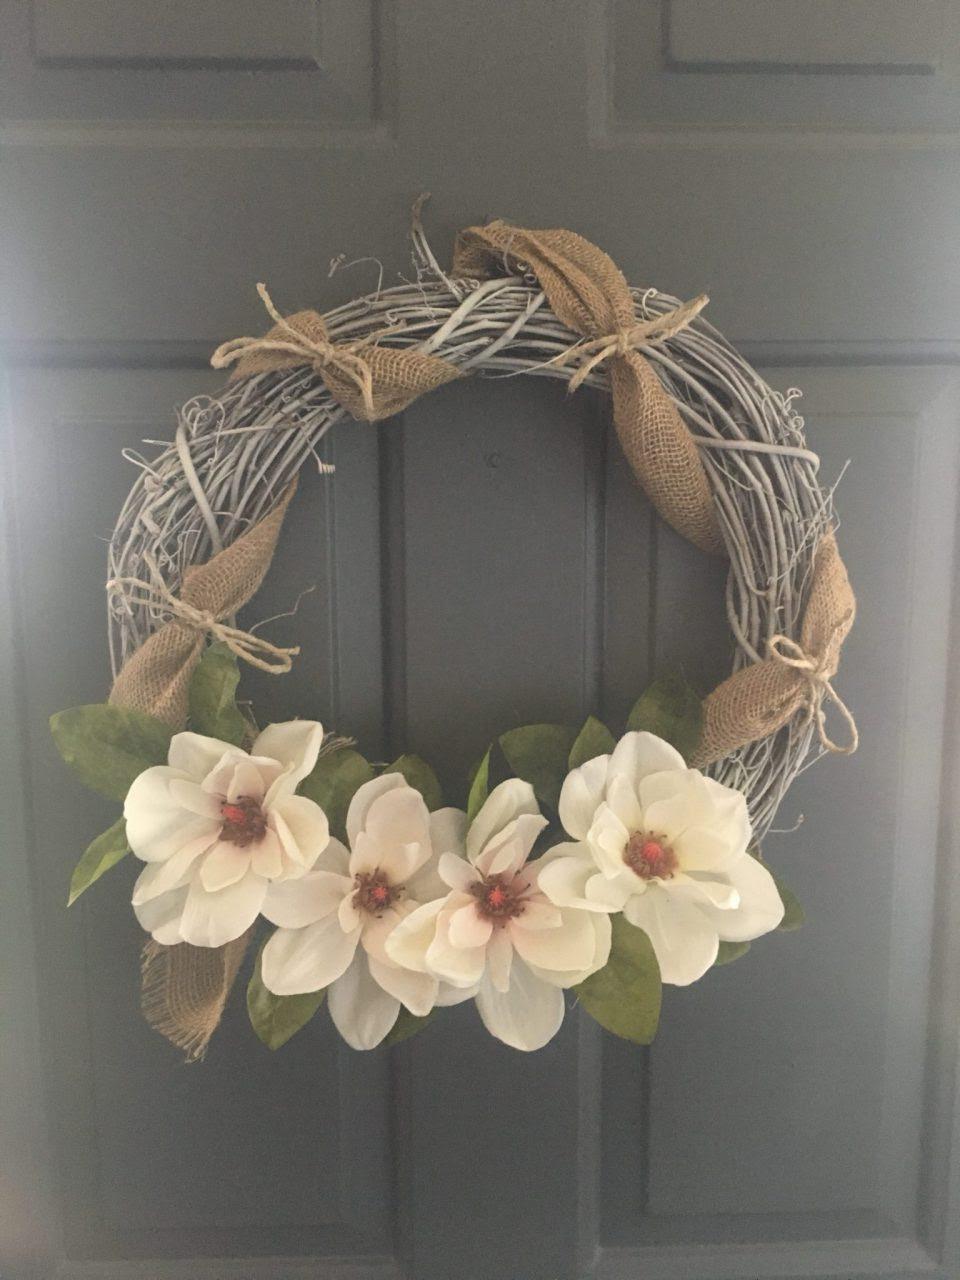 grapevine-wreath-diy